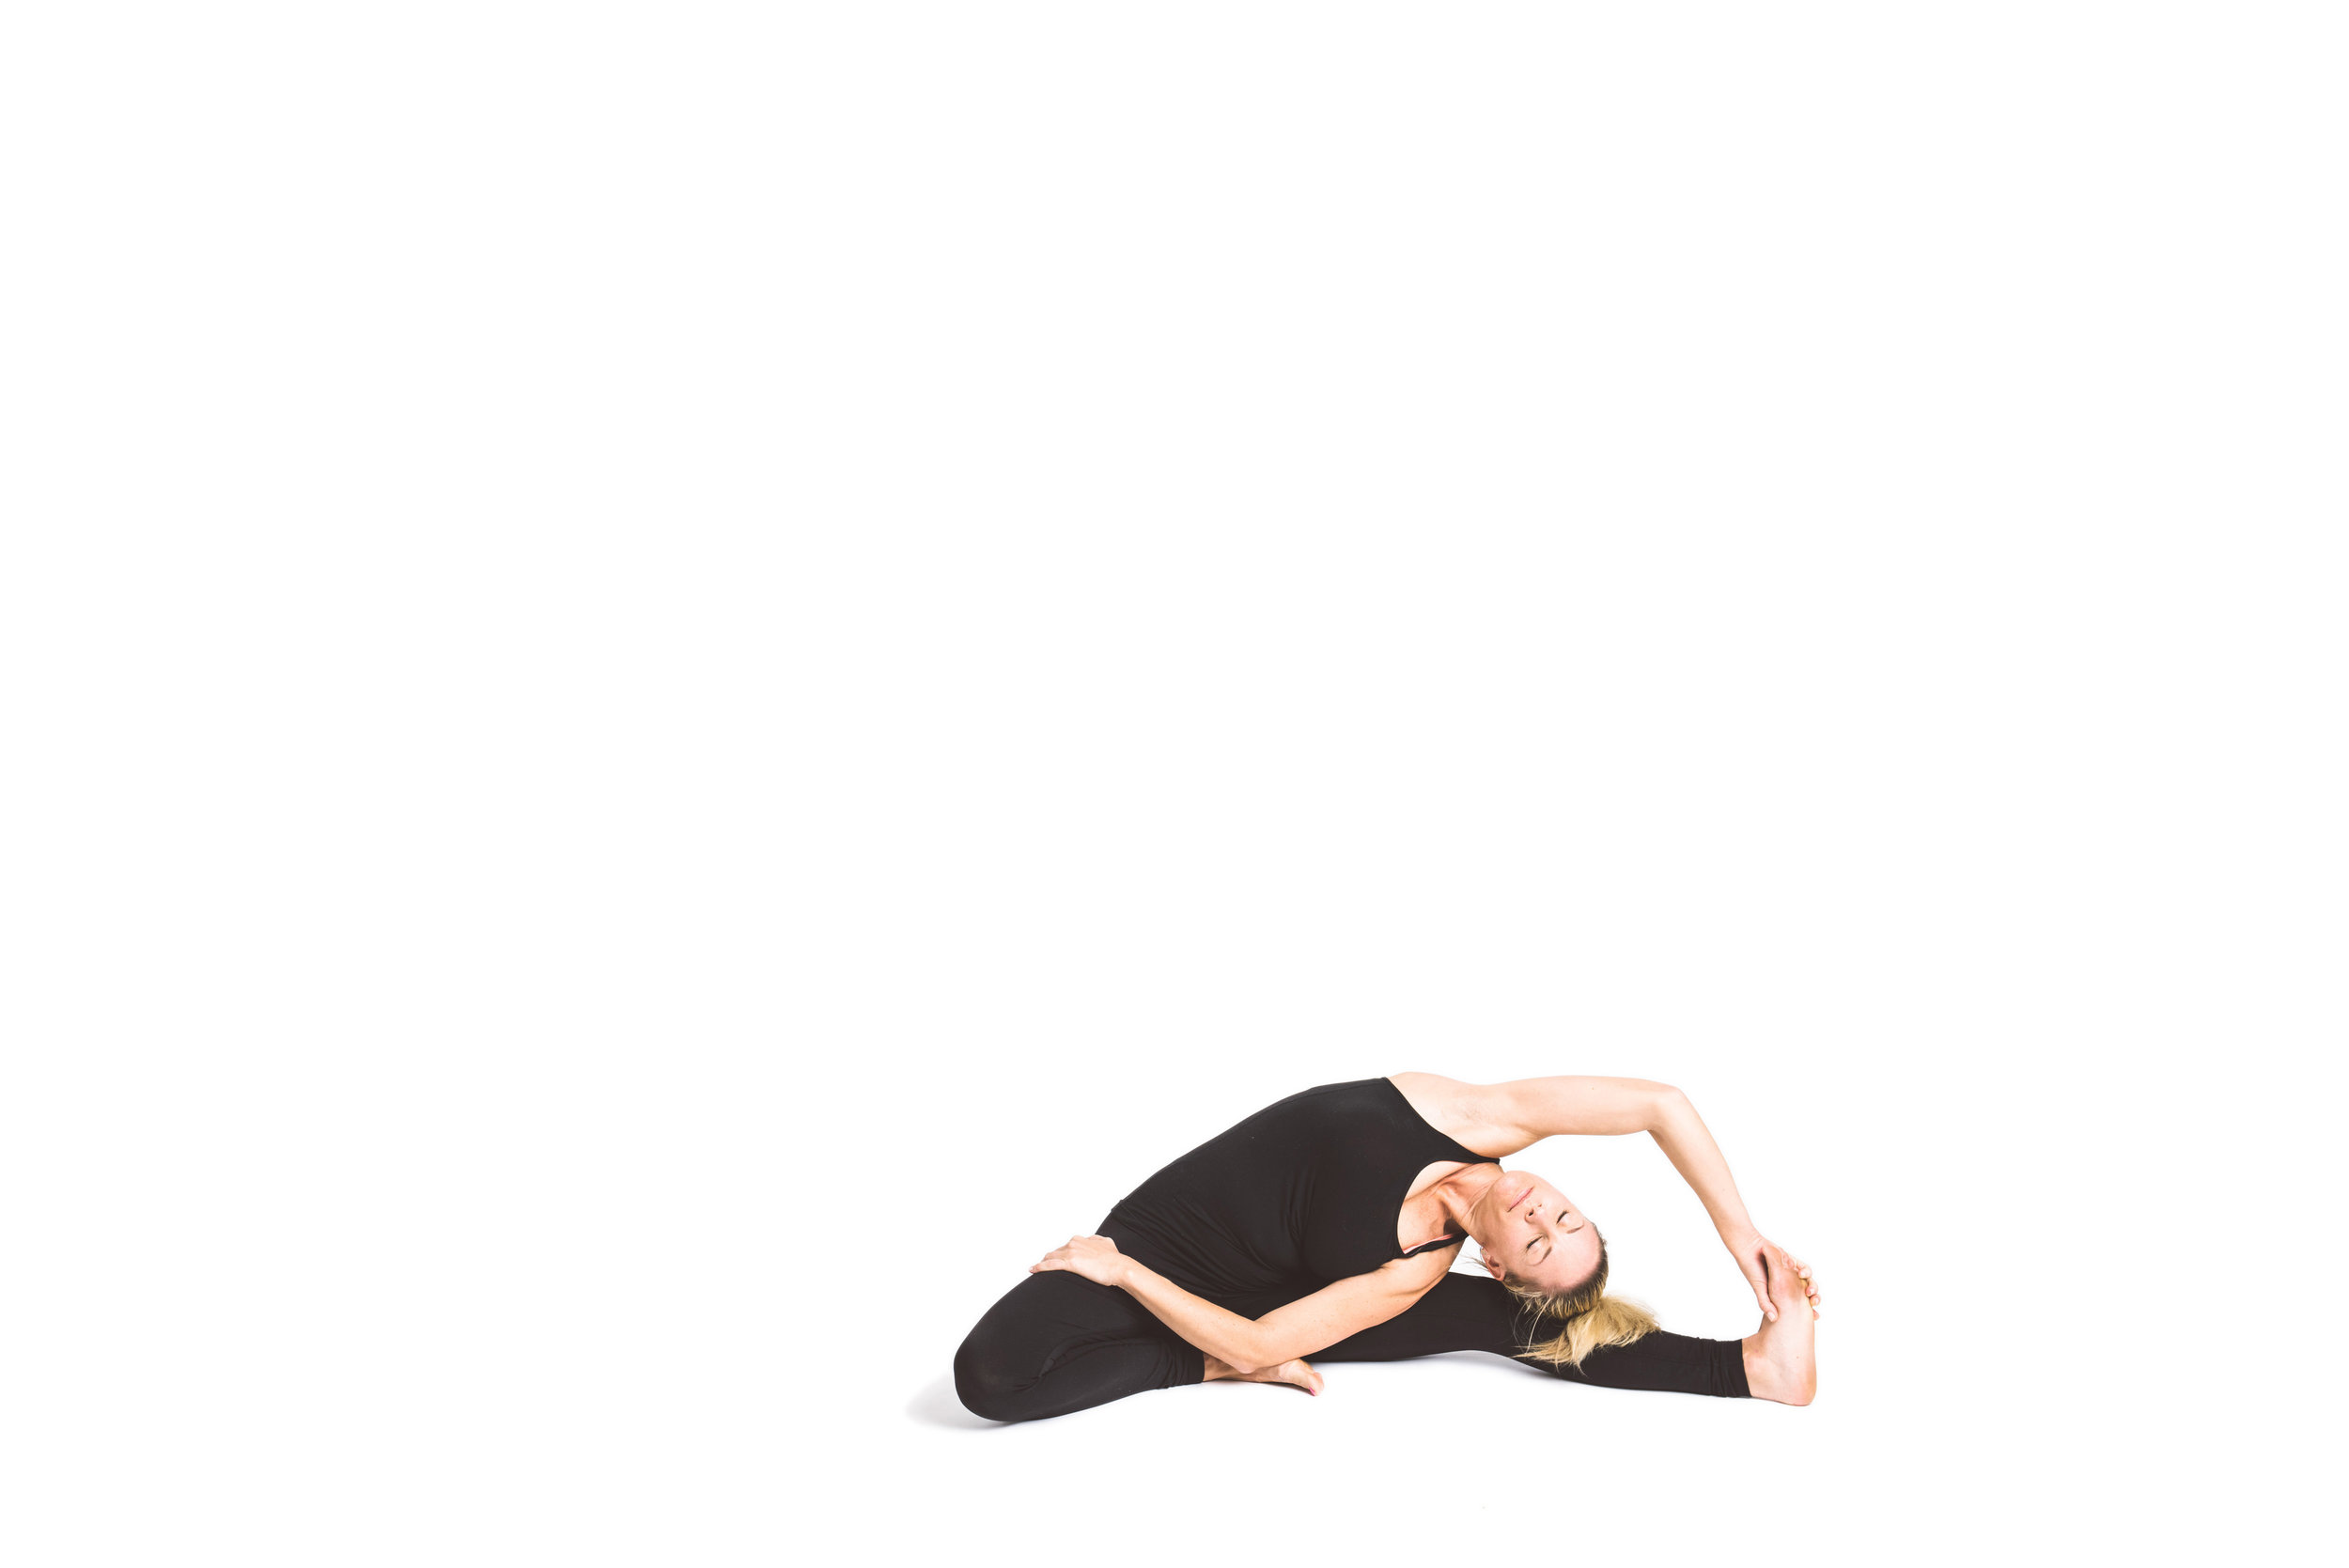 holy_yoga_by_lucas_botz_099.jpg